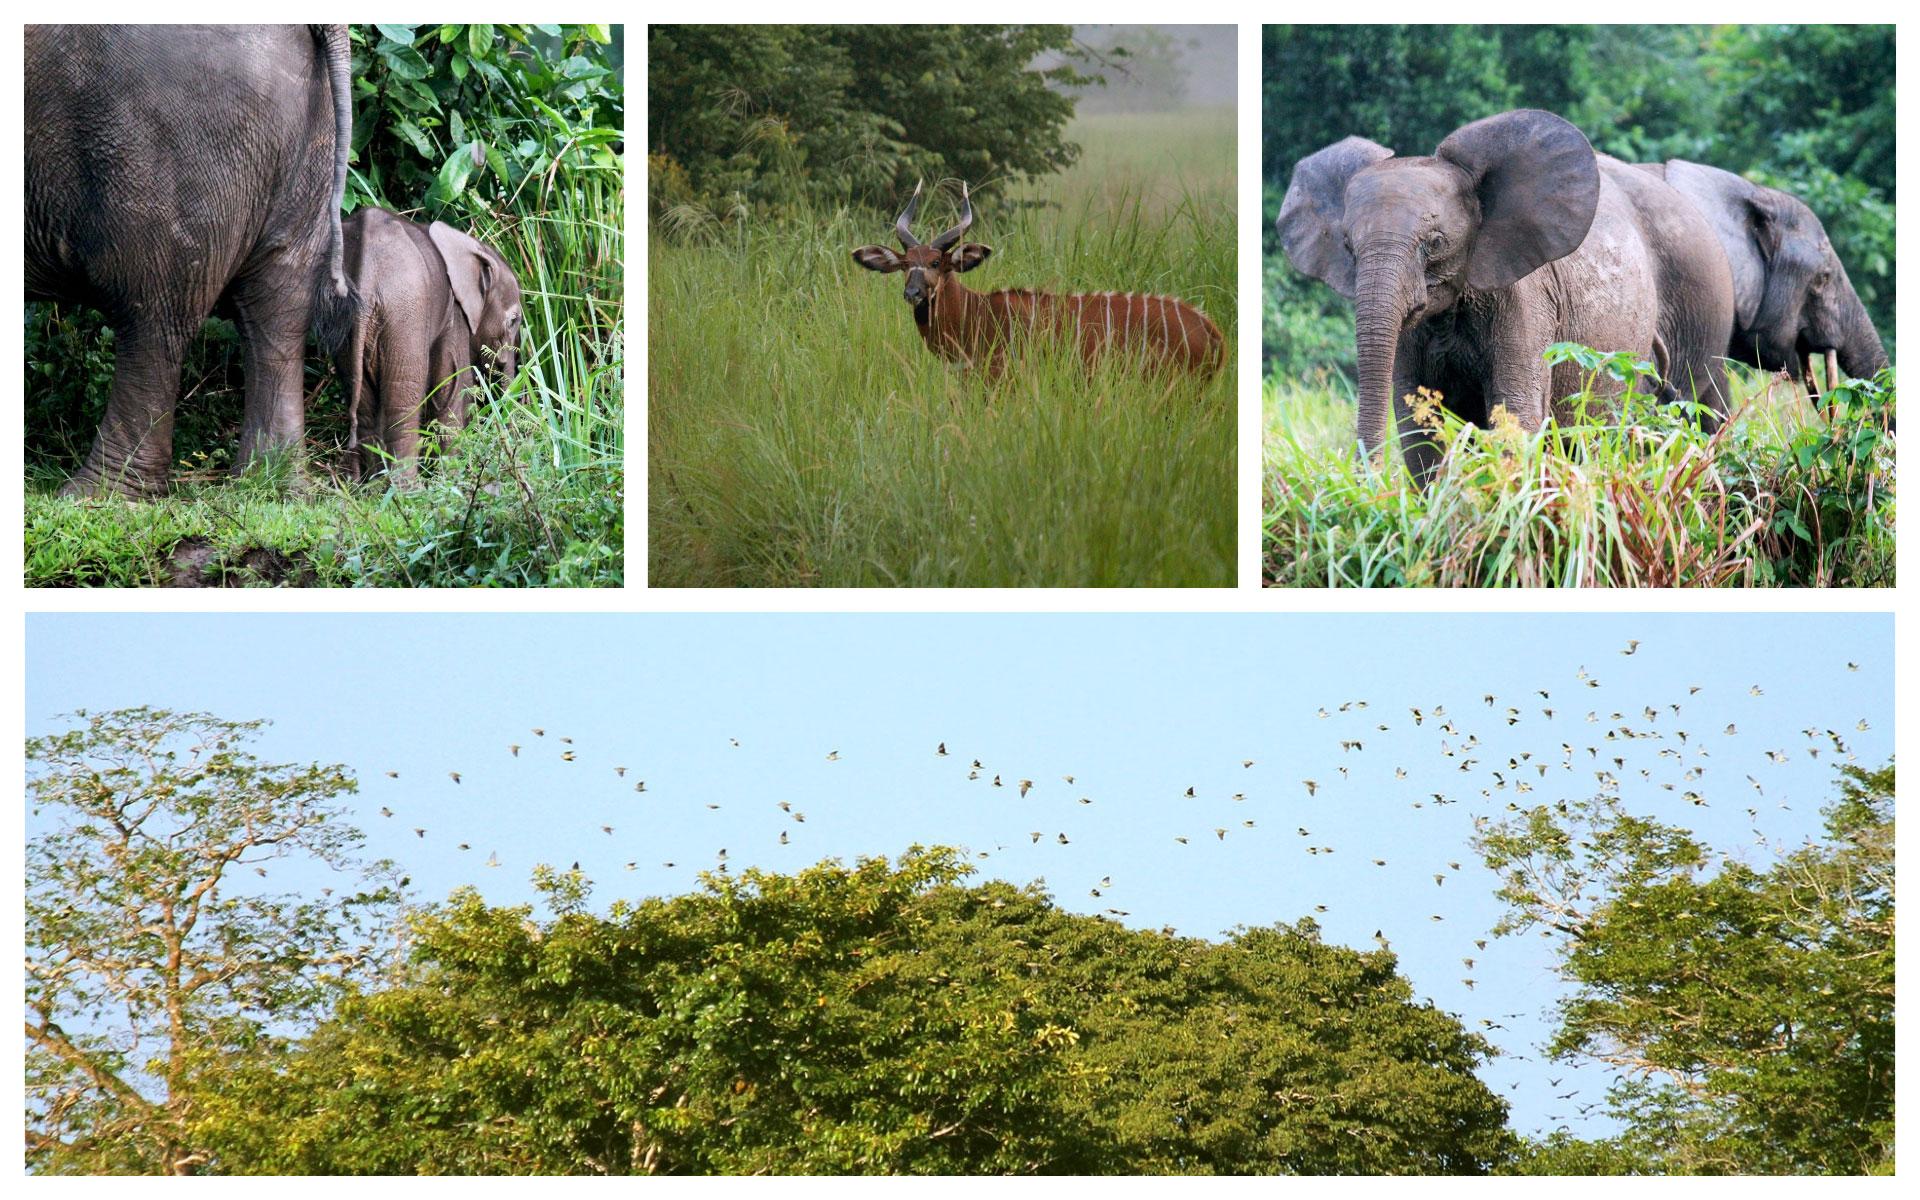 elephants-bongo-green-pigeons